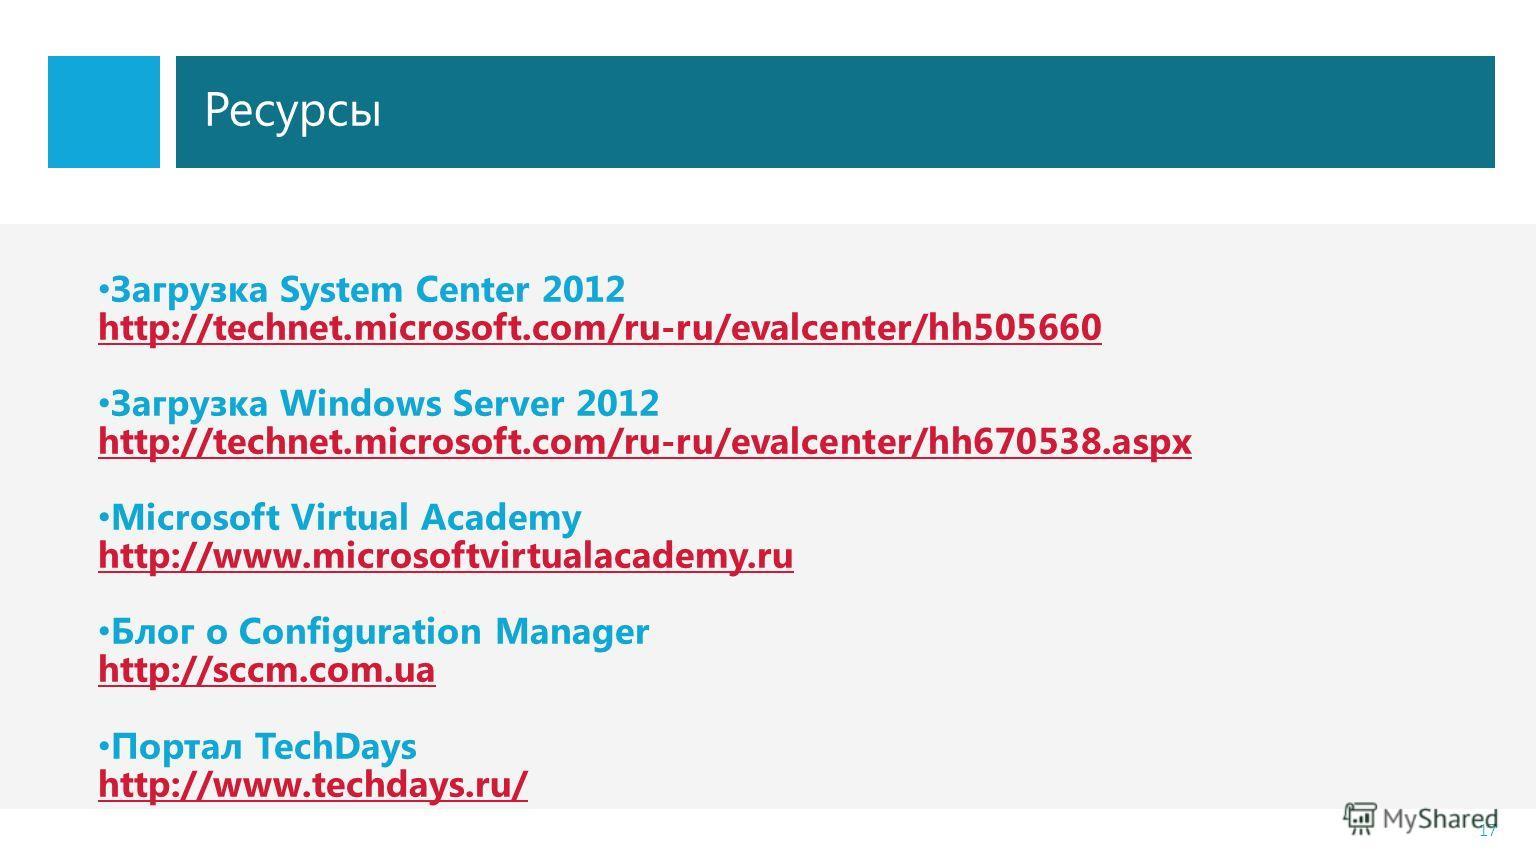 Ресурсы 17 Загрузка System Center 2012 http://technet.microsoft.com/ru-ru/evalcenter/hh505660 Загрузка Windows Server 2012 http://technet.microsoft.com/ru-ru/evalcenter/hh670538.aspx Microsoft Virtual Academy http://www.microsoftvirtualacademy.ru Бло